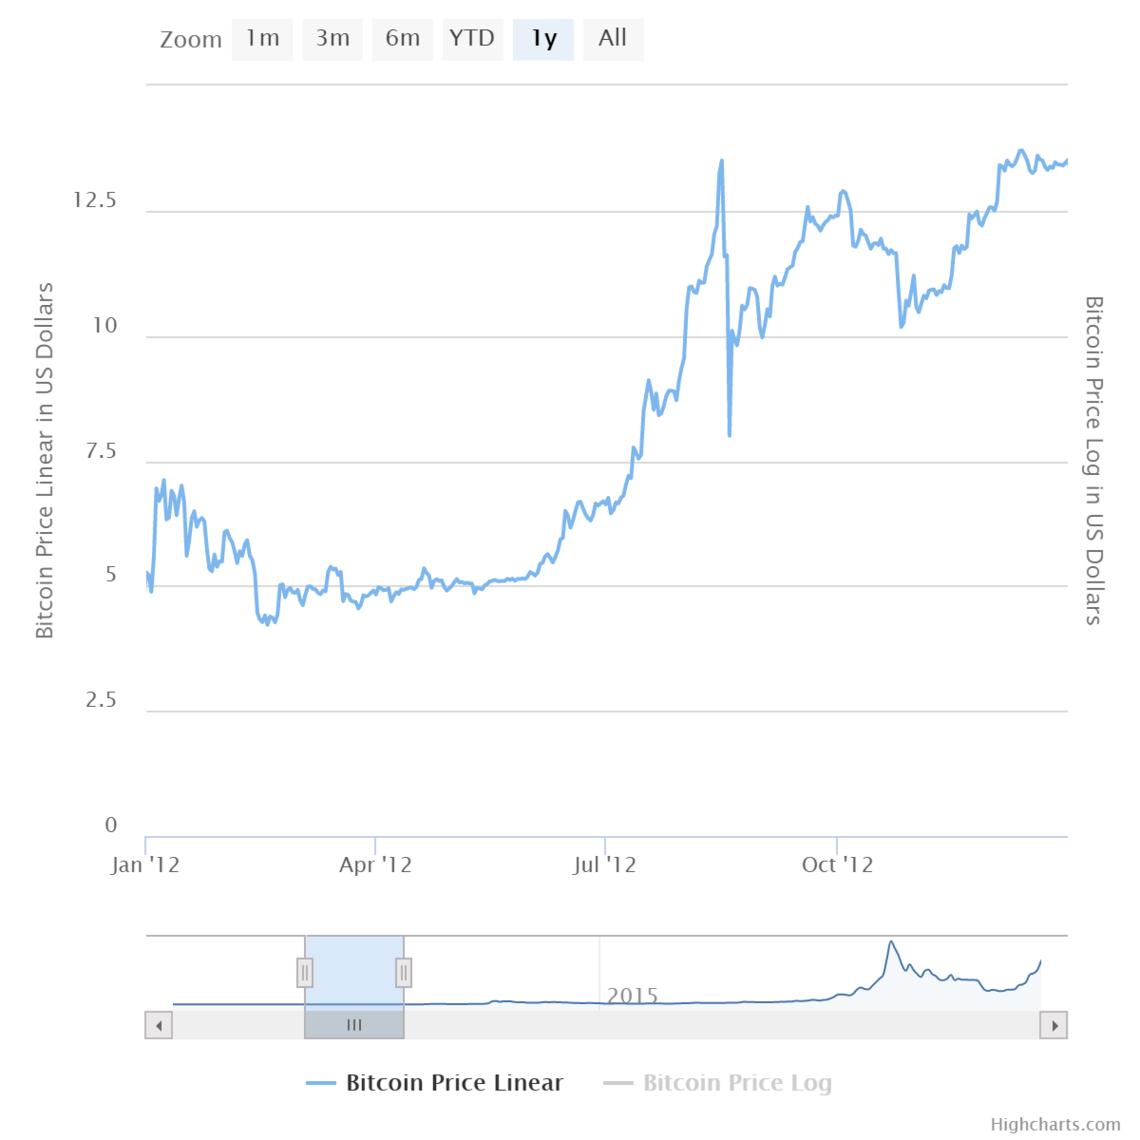 $1 Billion Bitcoin Shopping Spree to Hit Dark Web in 2019